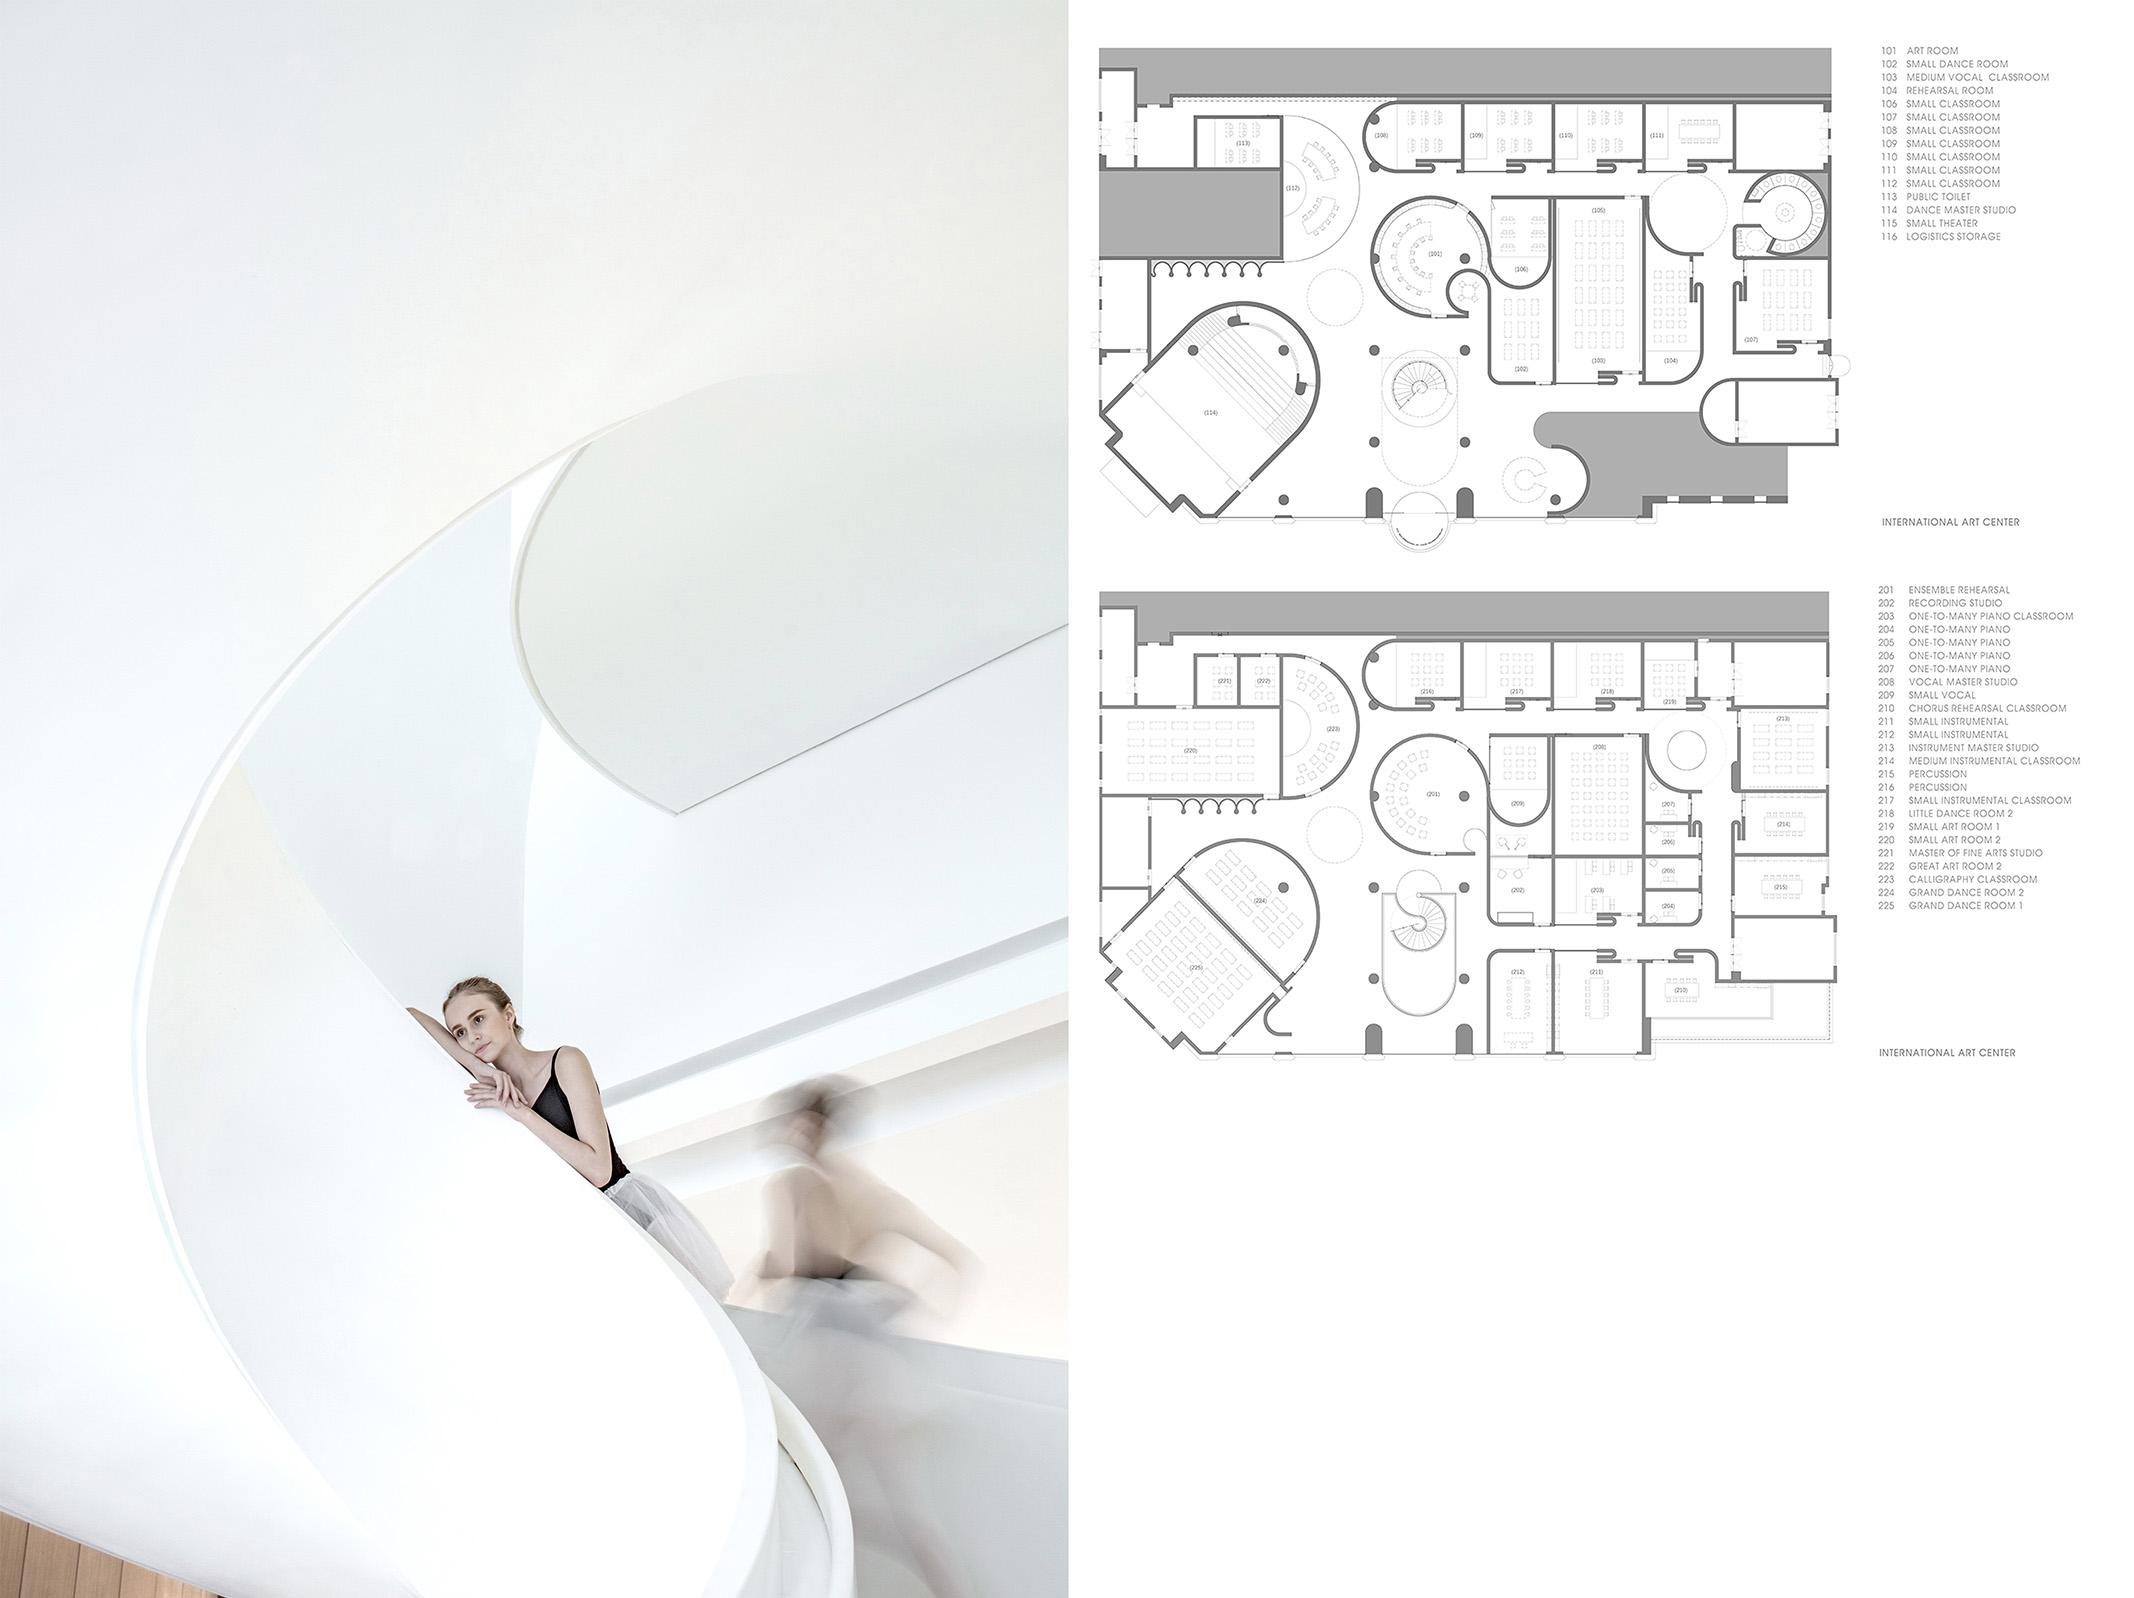 IMAGE # 09 Conceptual plan PONE ARCHITECTURE